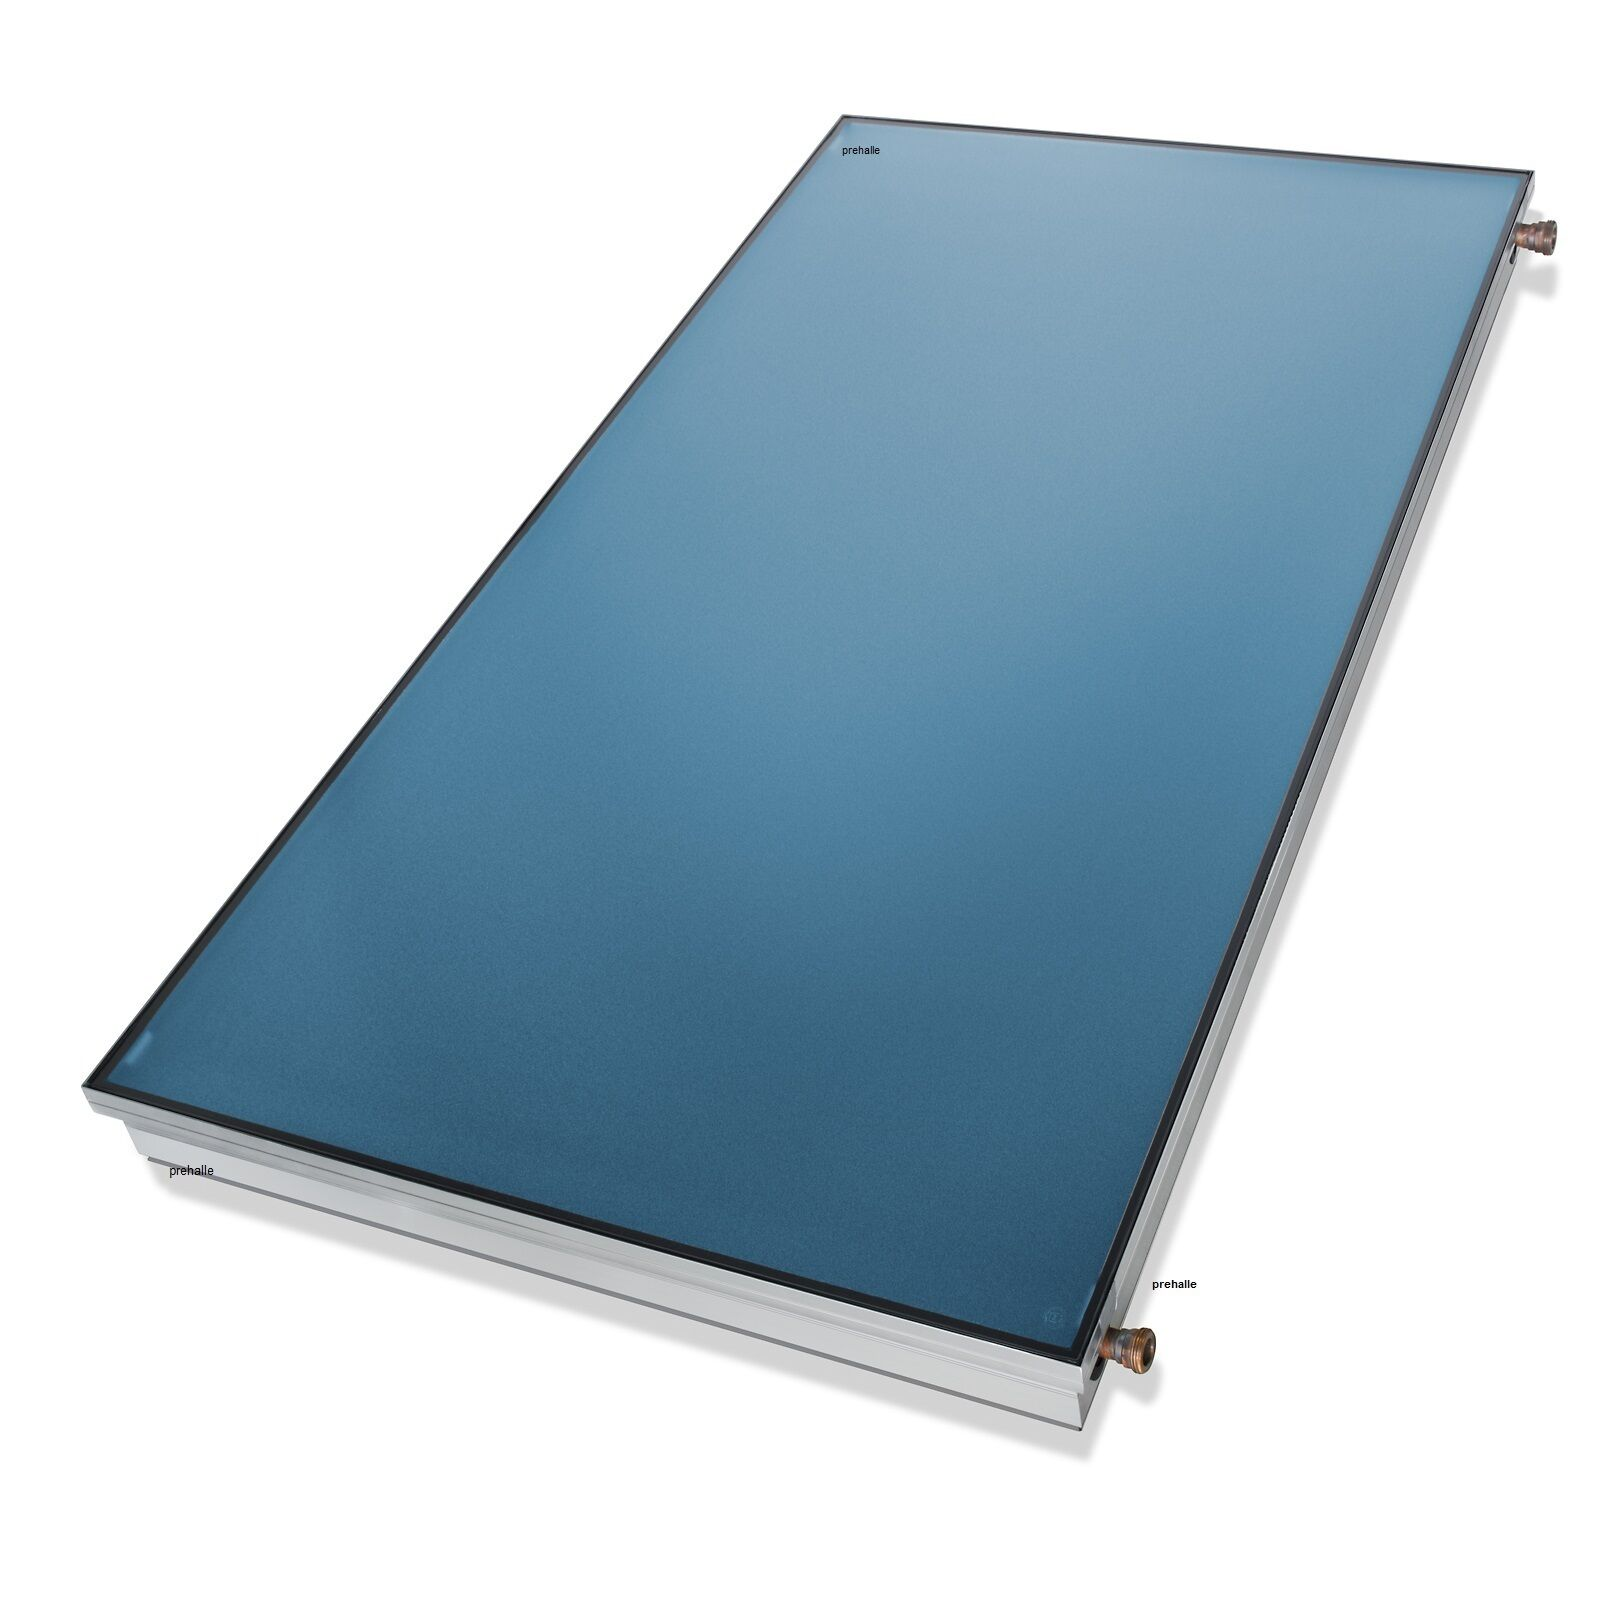 1A PRE 7,02m² Flachkollektor Solar Anlage + Solarspeicher 500L emailliert, 2 WT